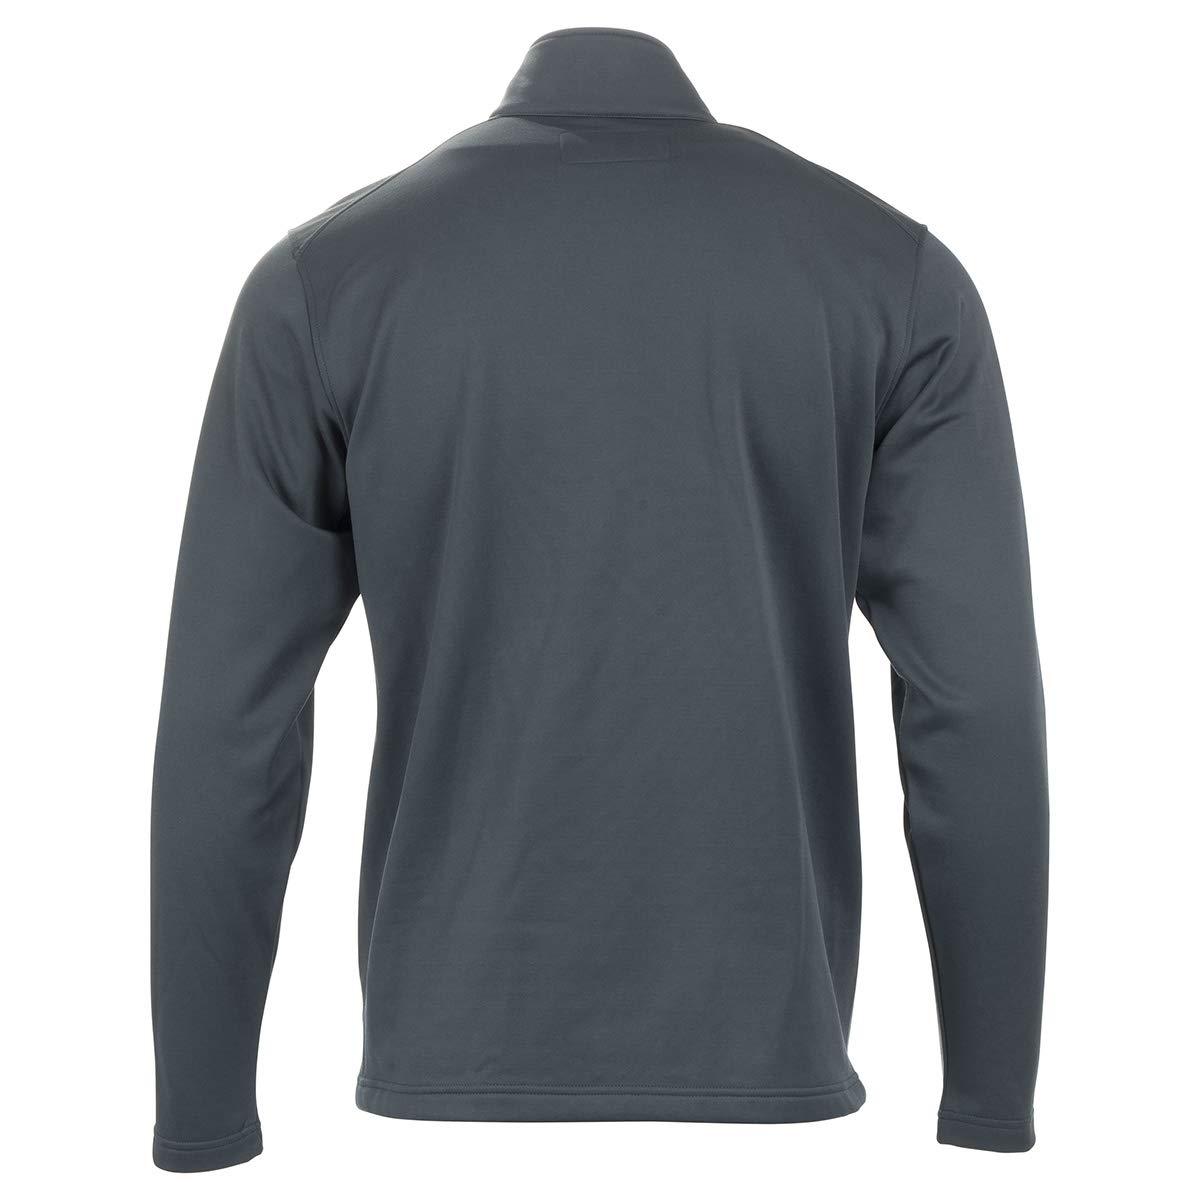 Black - 2X-Large 509 Stroma Fleece Shirt